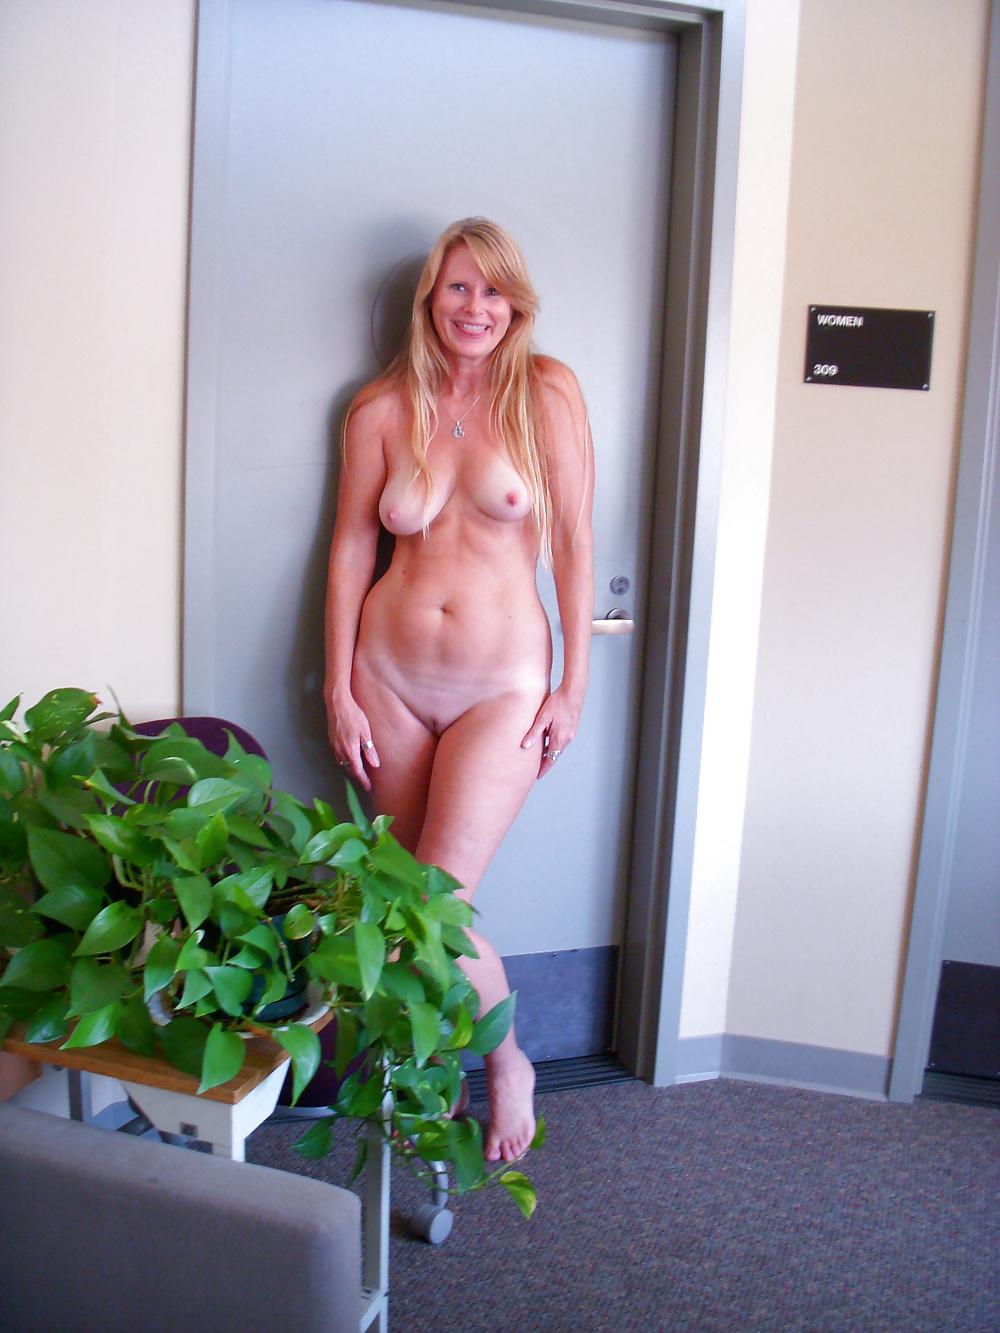 Naked girl hallway dare sex mom fuck